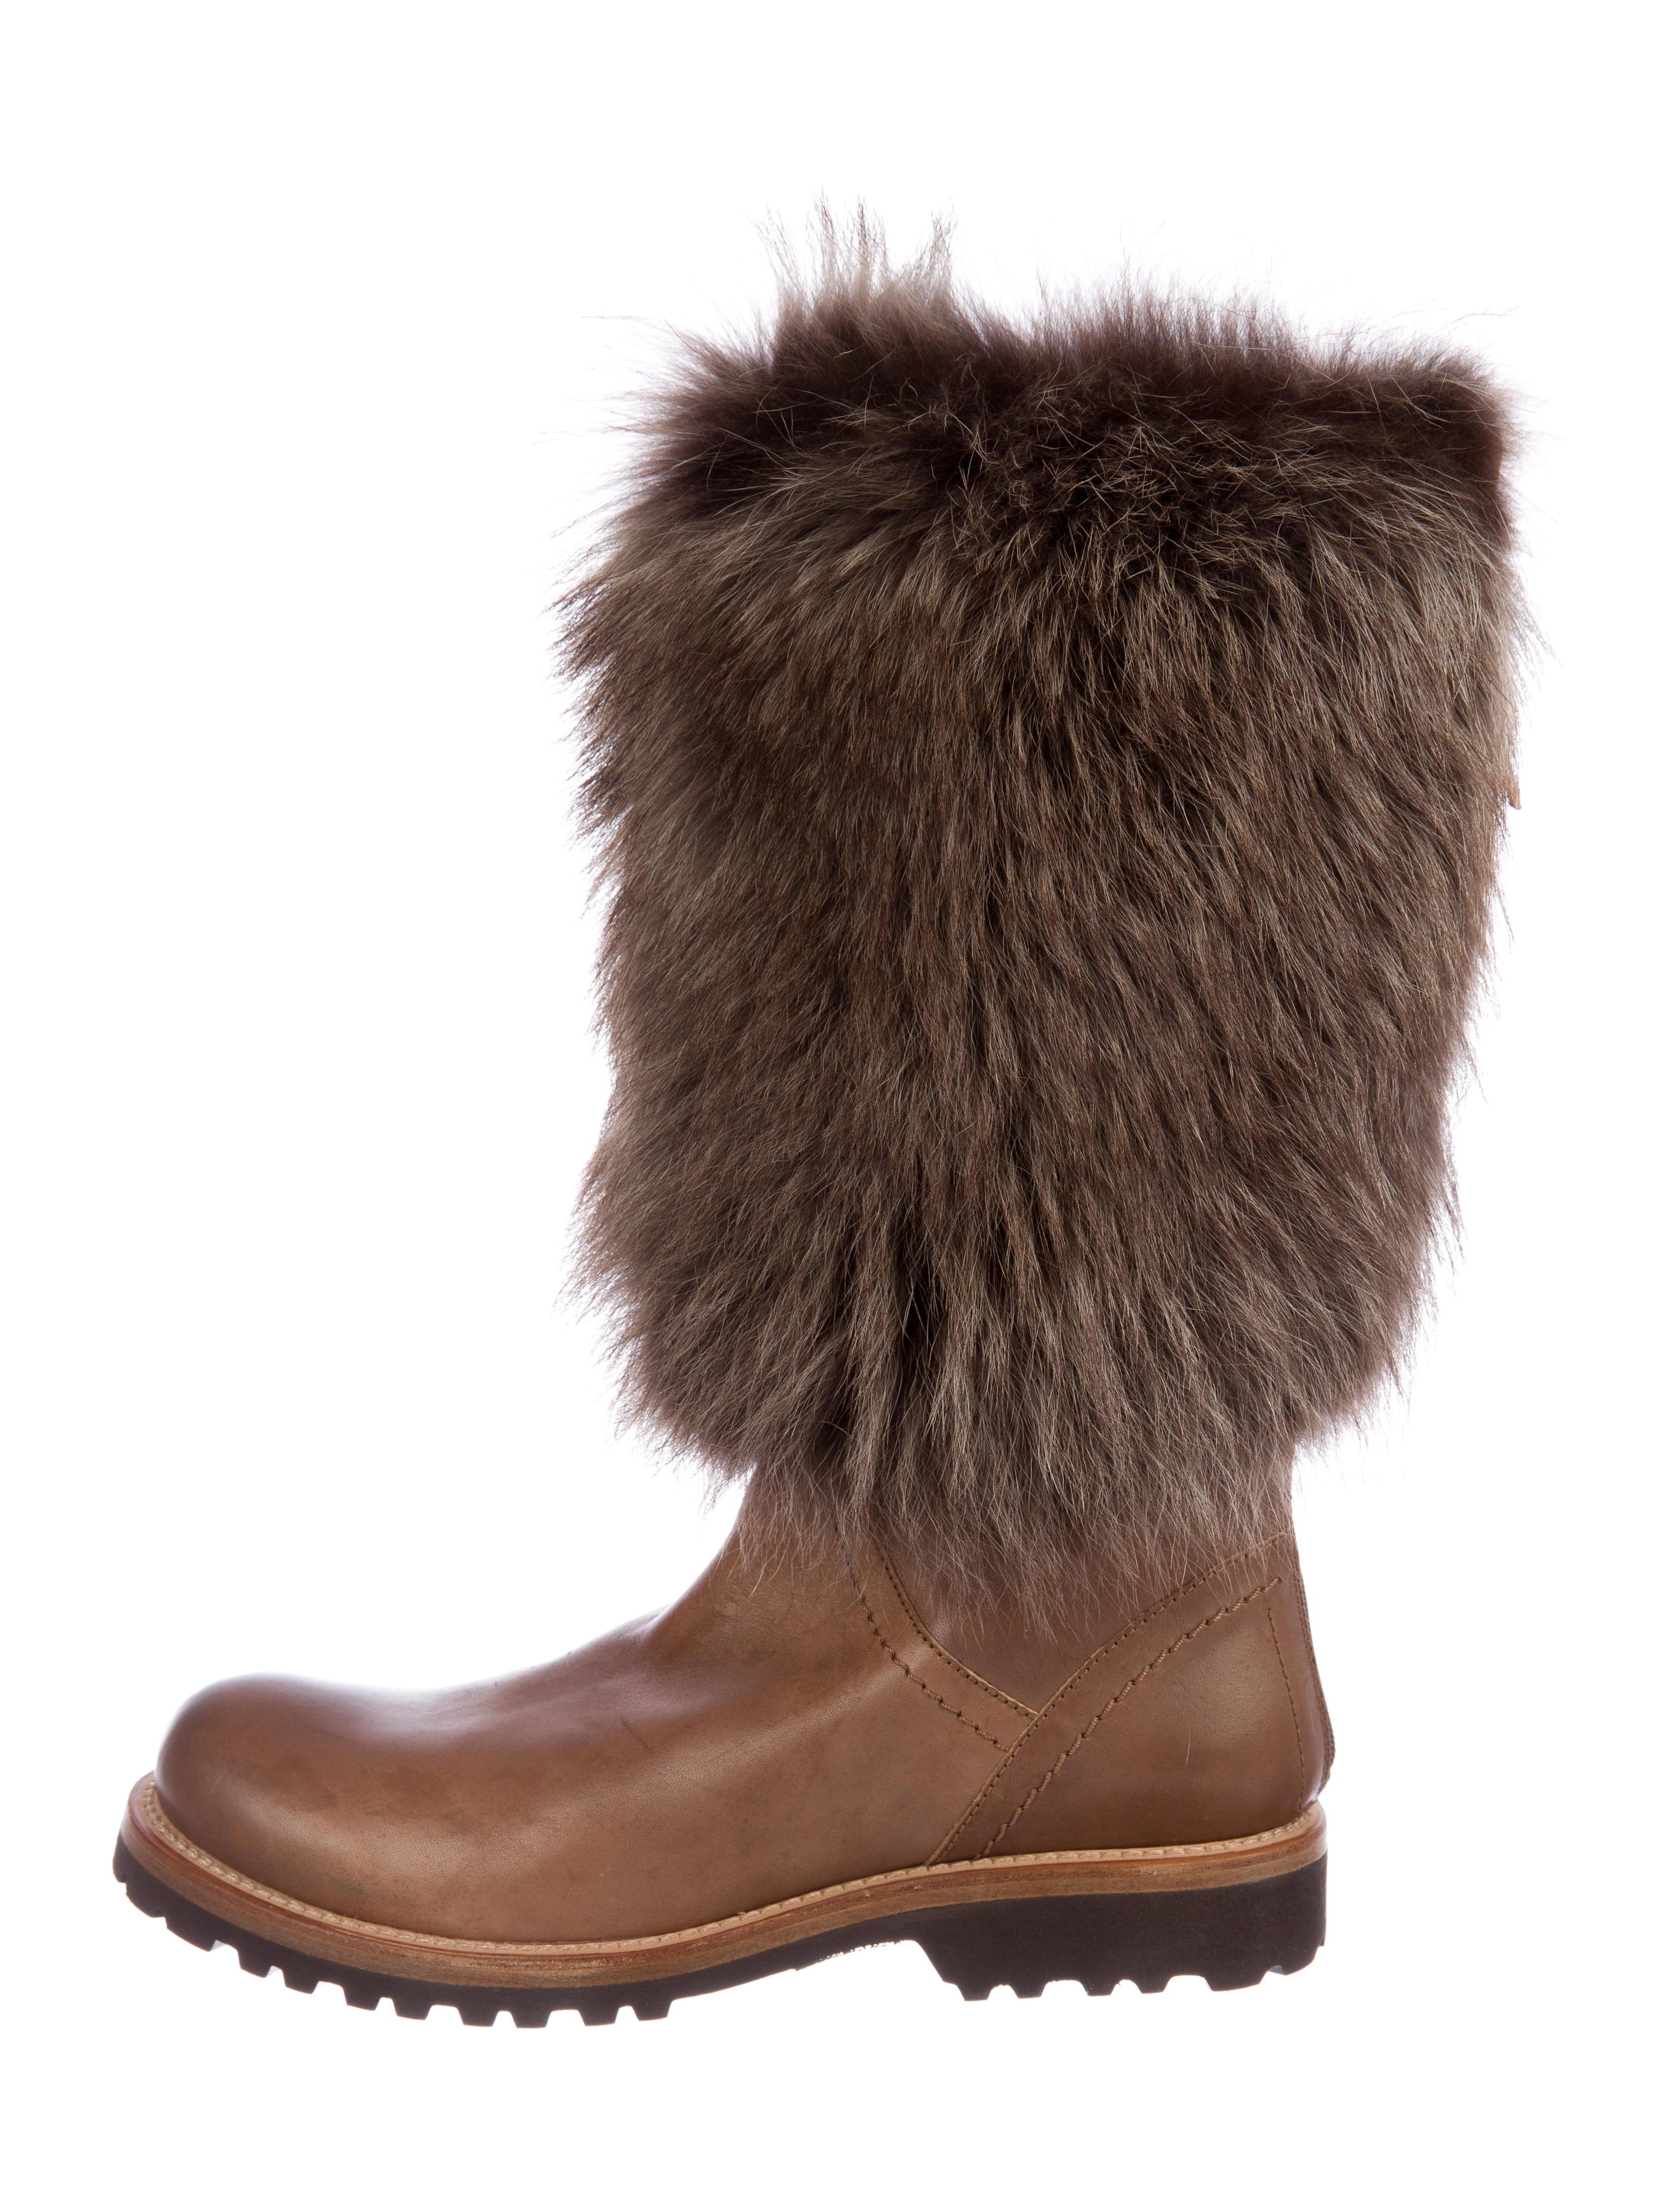 Brunello Cucinelli Leather Mid-Calf Boots w/ Tags perfect OJa2wjznqk